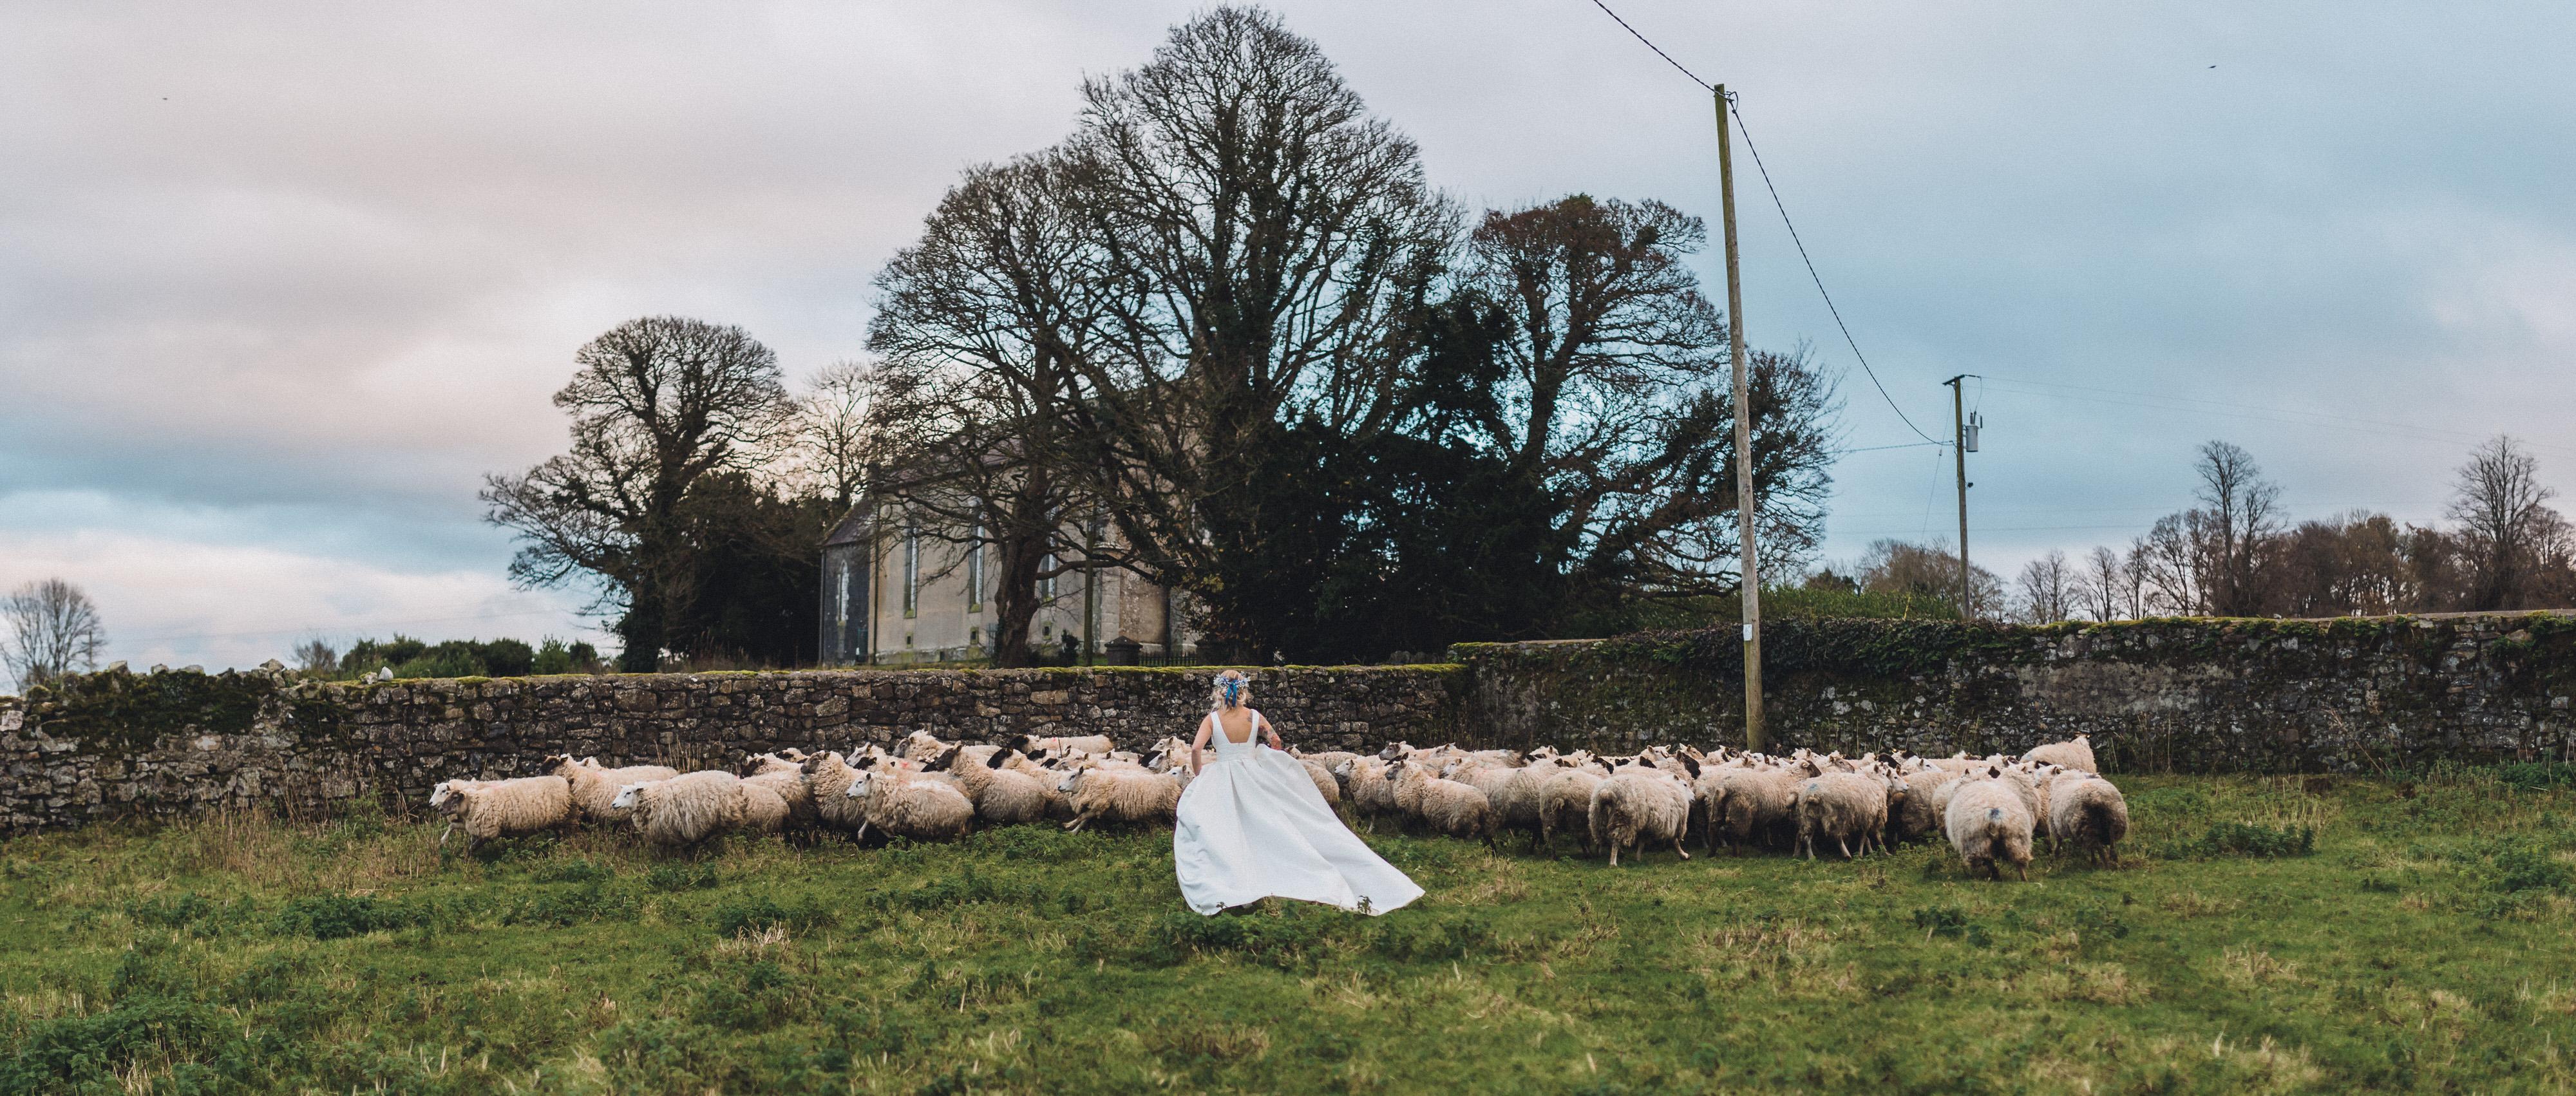 Bride running toward flock of sheep - photo by John Gillooley